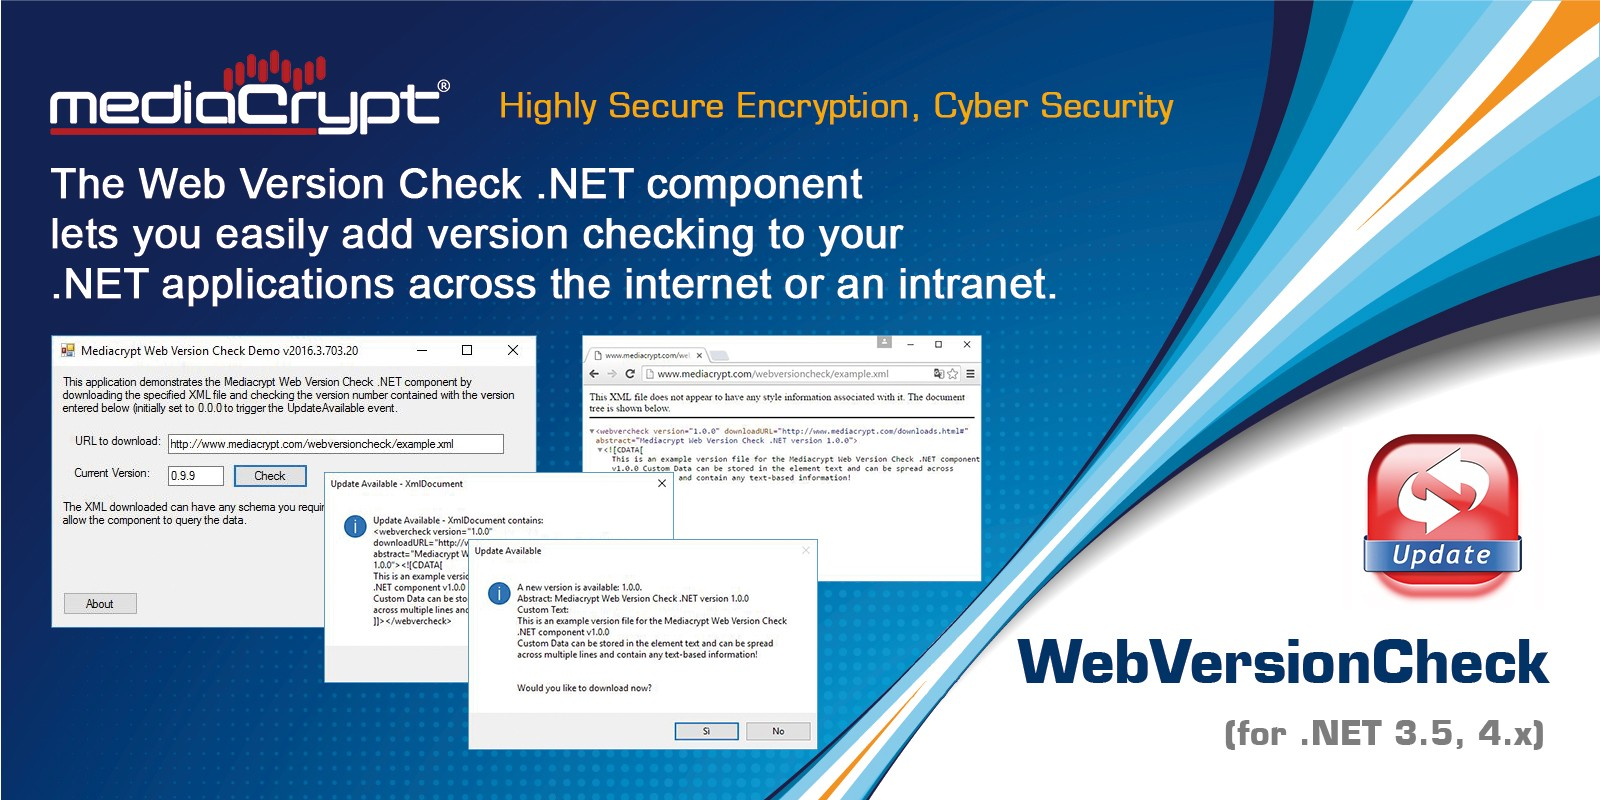 Mediacrypt WebVersionCheck .NET